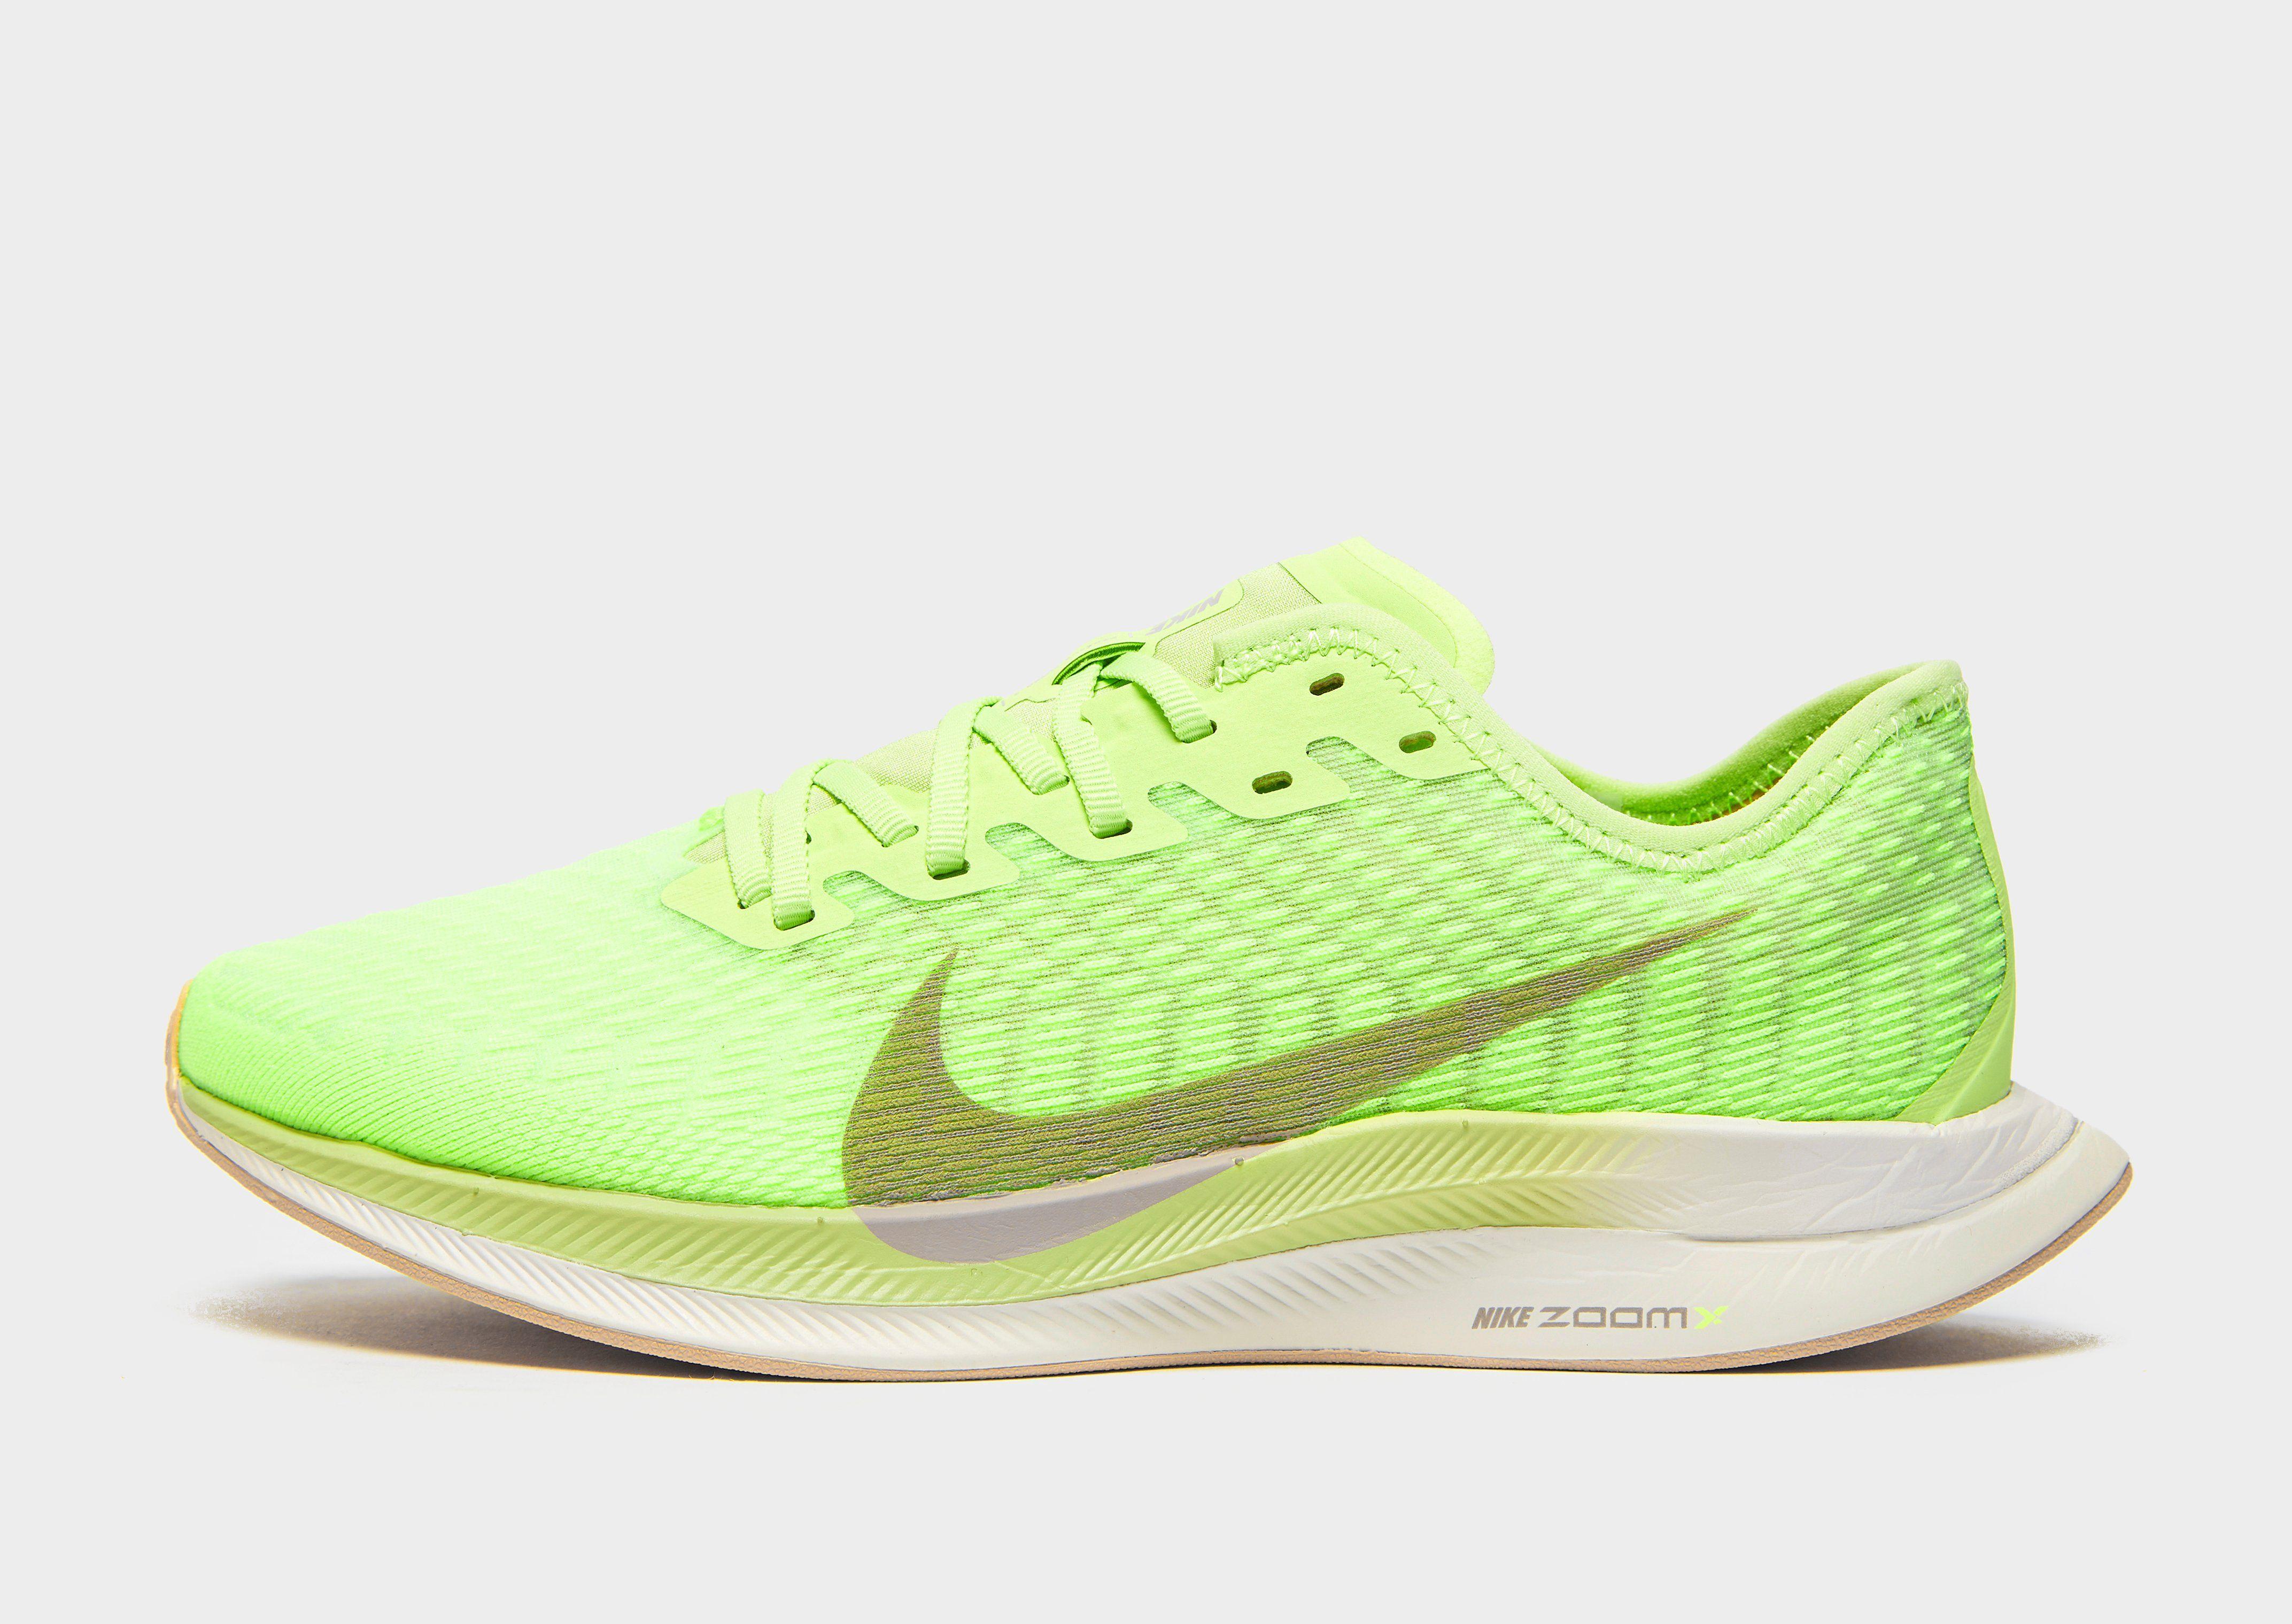 meilleur service a2efb 30cdc Nike Zoom Pegasus Turbo 2 Women's Running Shoe | JD Sports